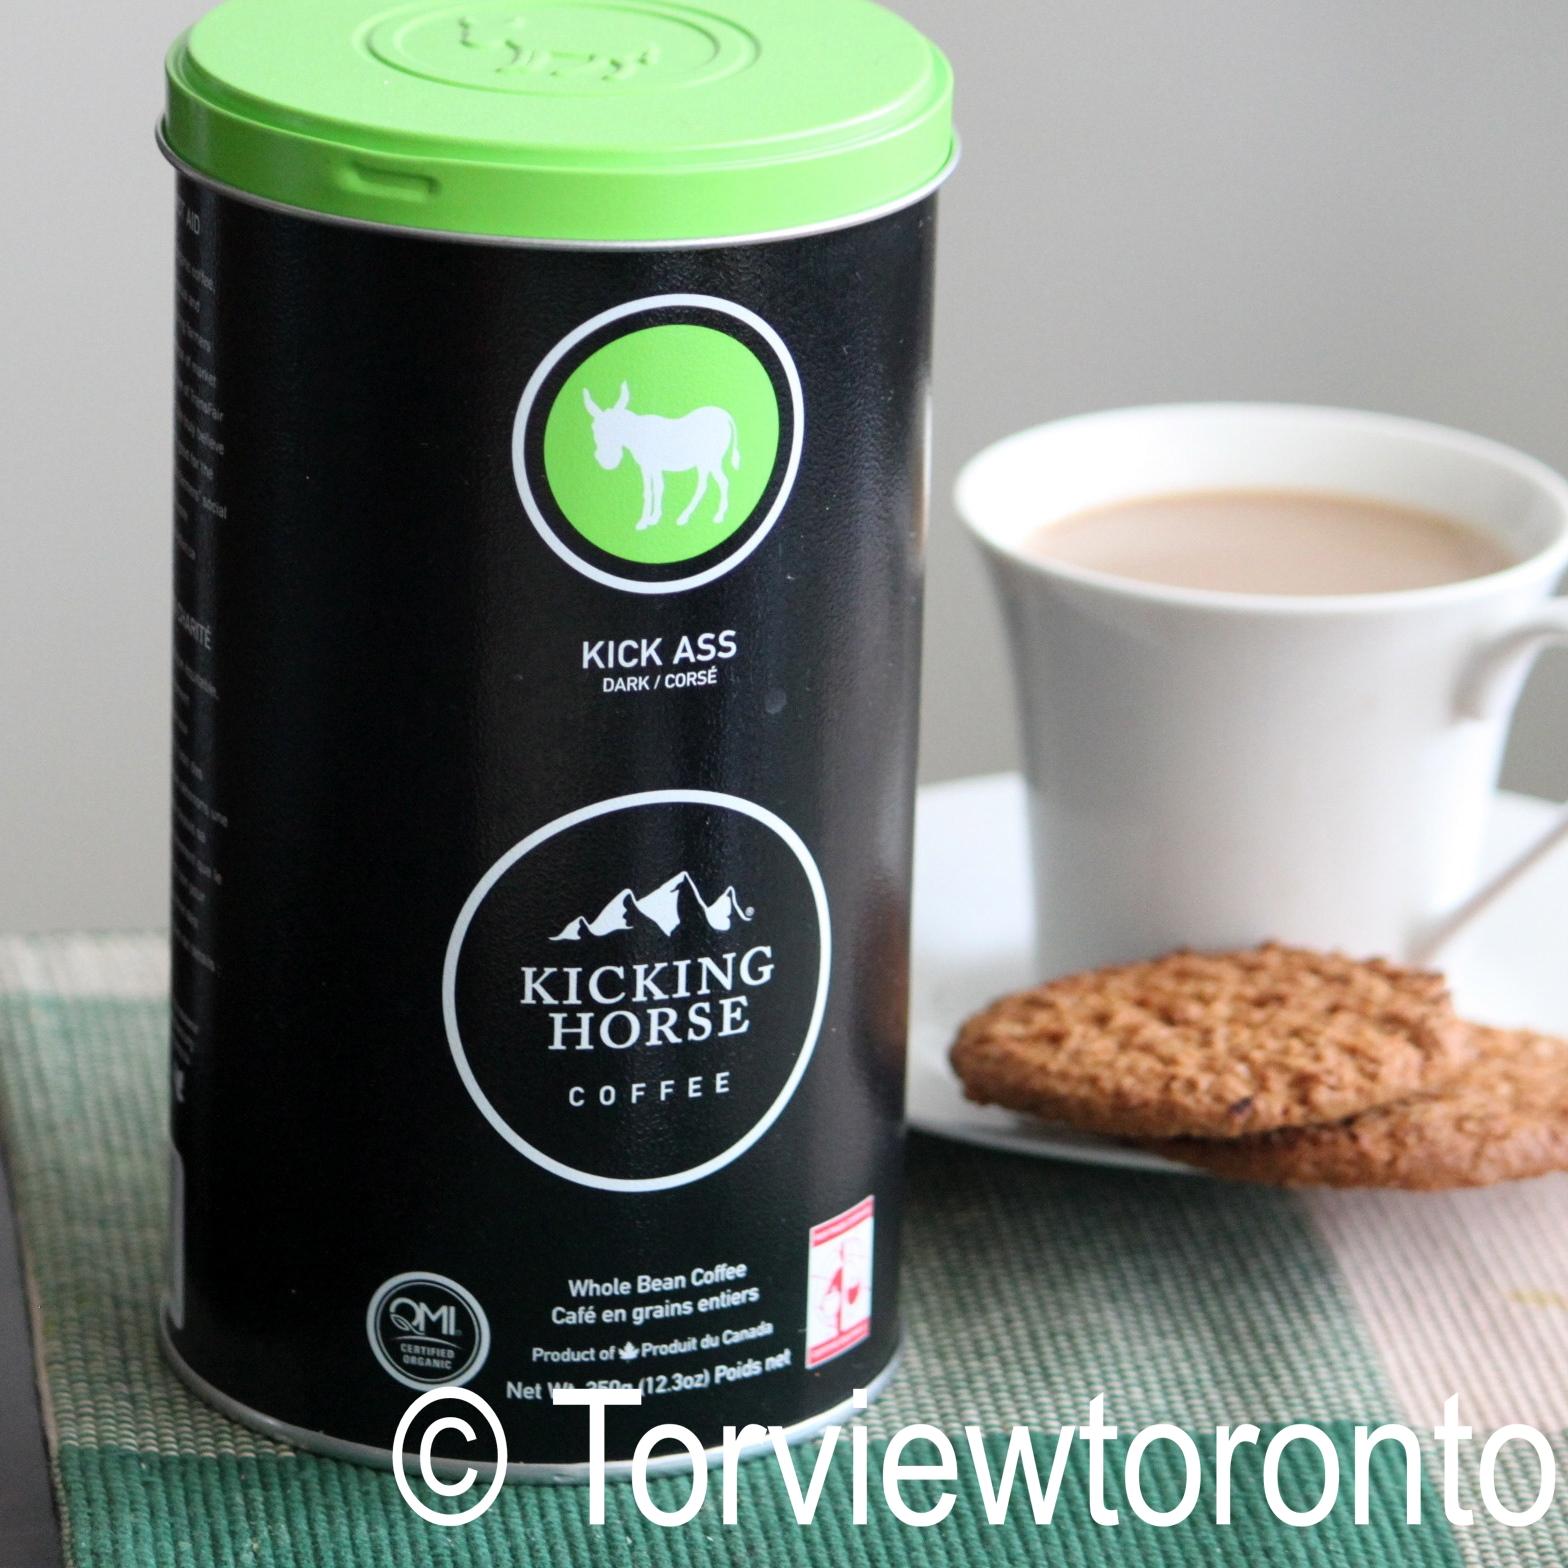 Fair Trade Coffee ~ Torviewtoronto organic fair trade kicking horse coffee